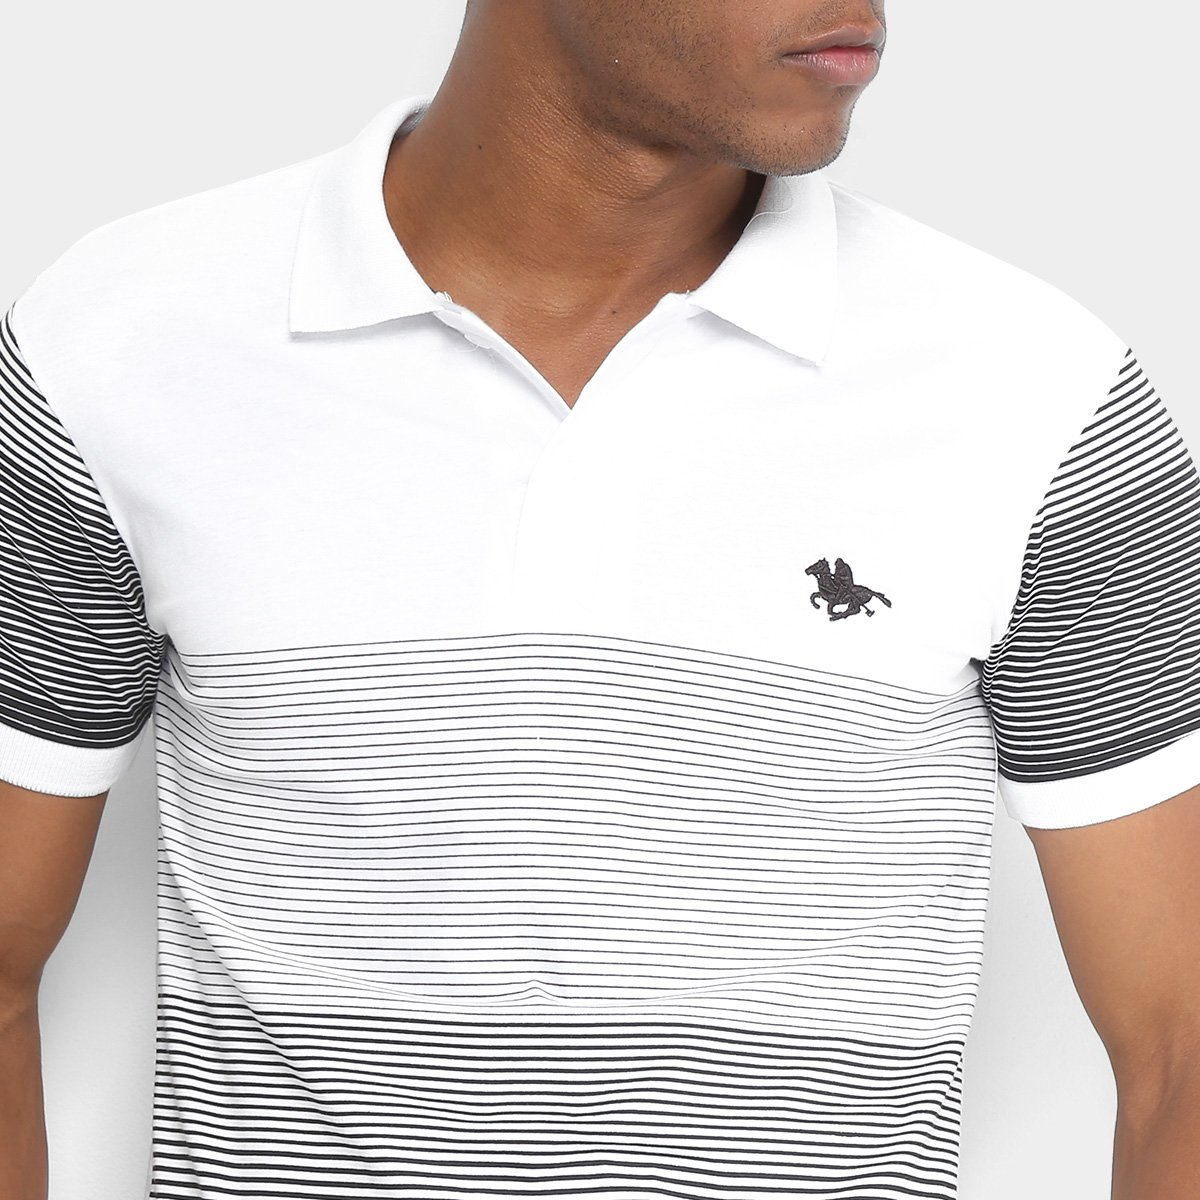 52f54e0b4f Camisa Polo RG 518 Listrada Degrade Masculina - Branco - Compre ...